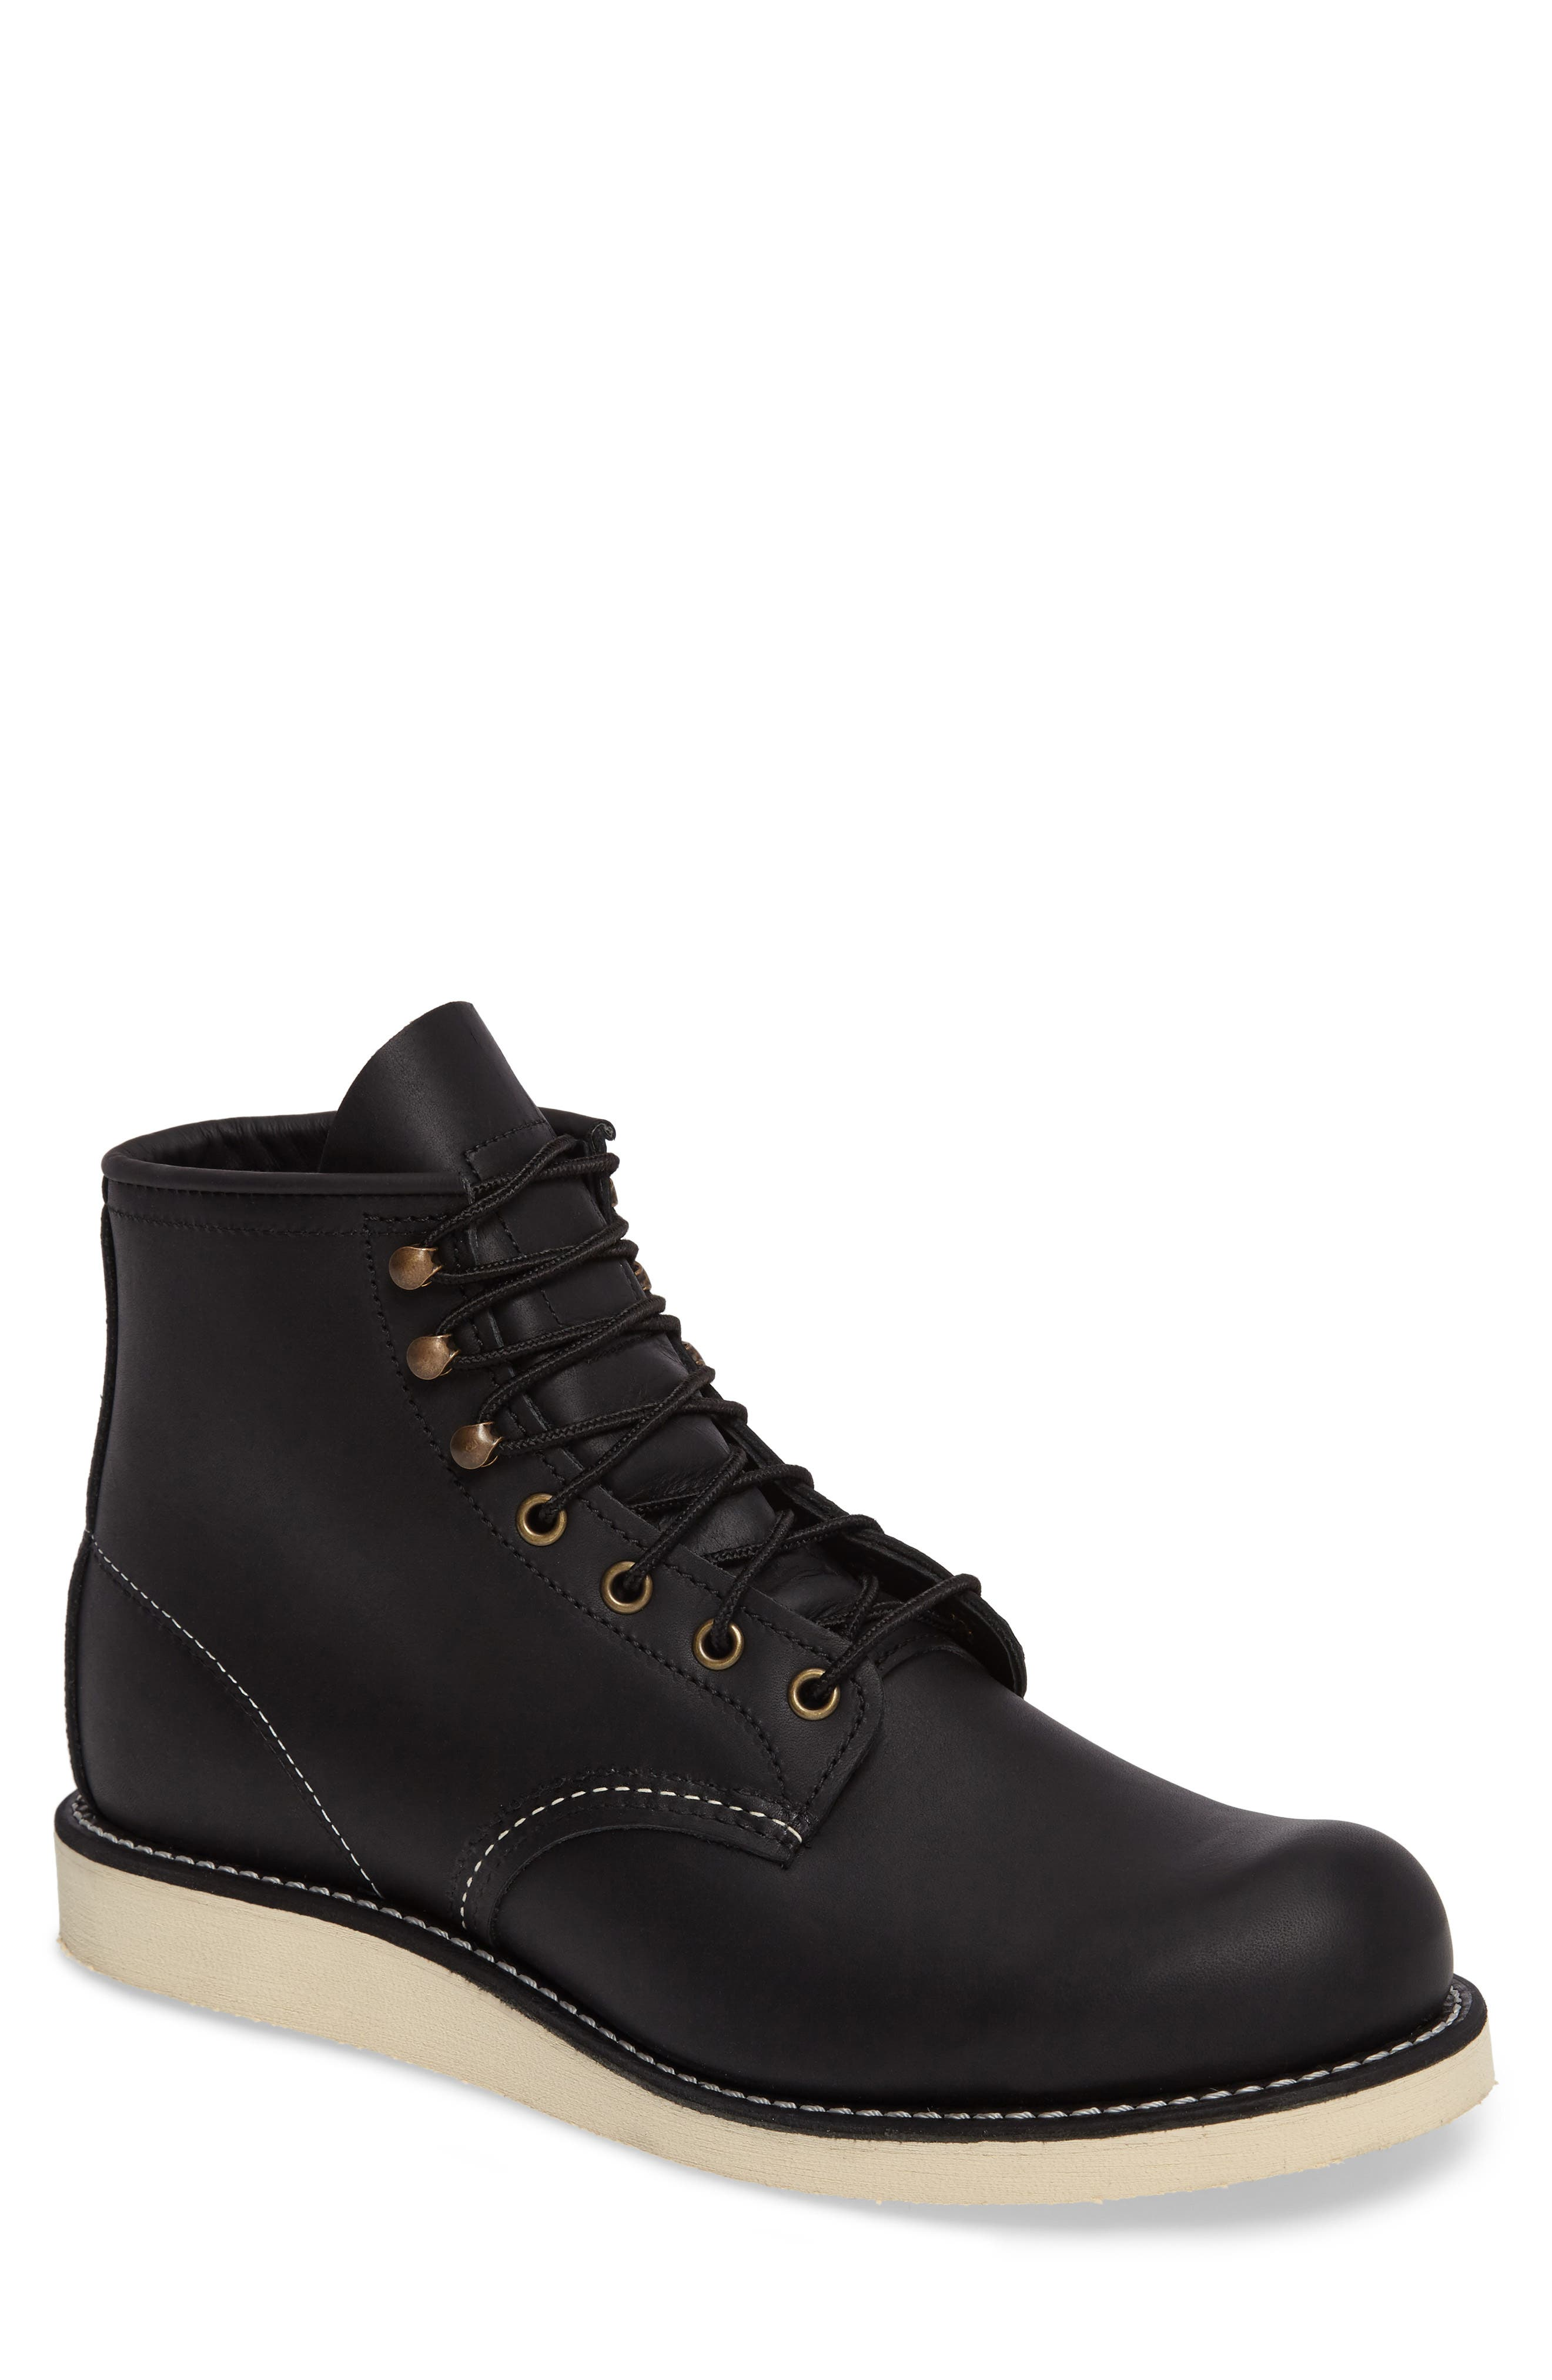 Rover Plain Toe Boot,                             Main thumbnail 1, color,                             Black Harness Leather